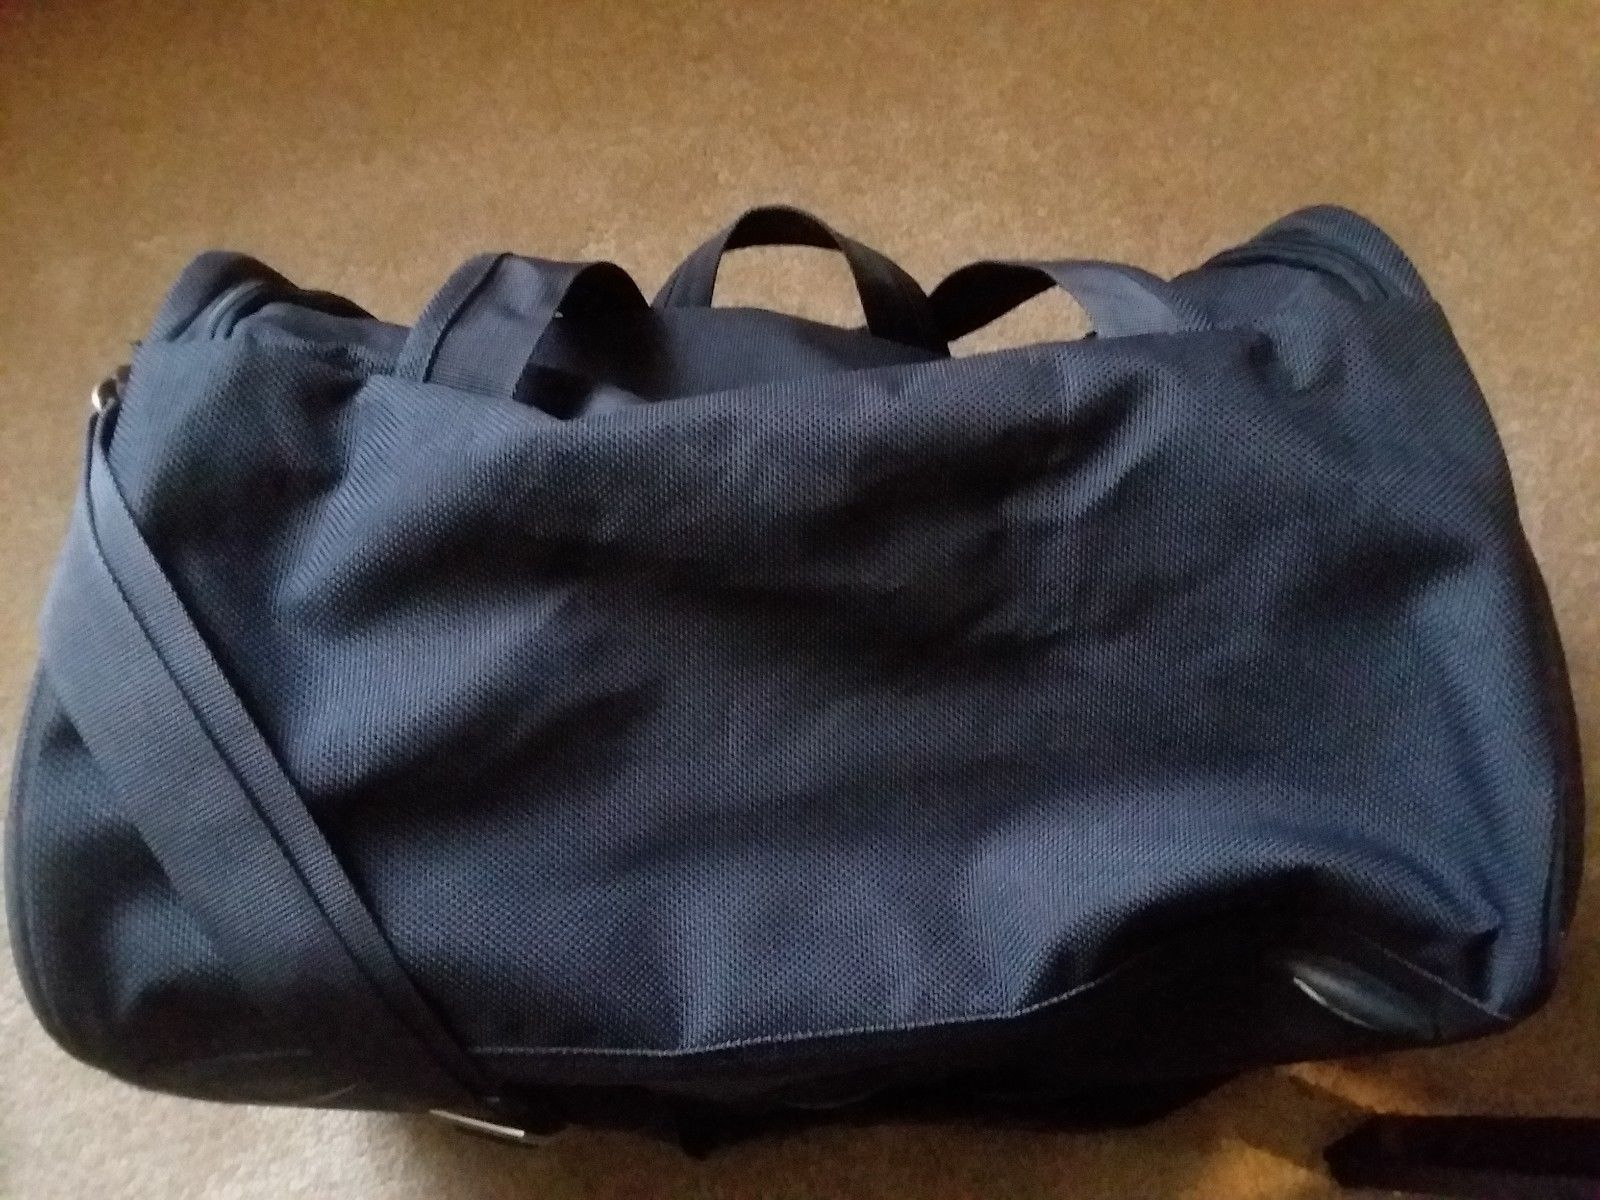 Samsonite Gray Yellow Travel Case Duffel Luggage image 2